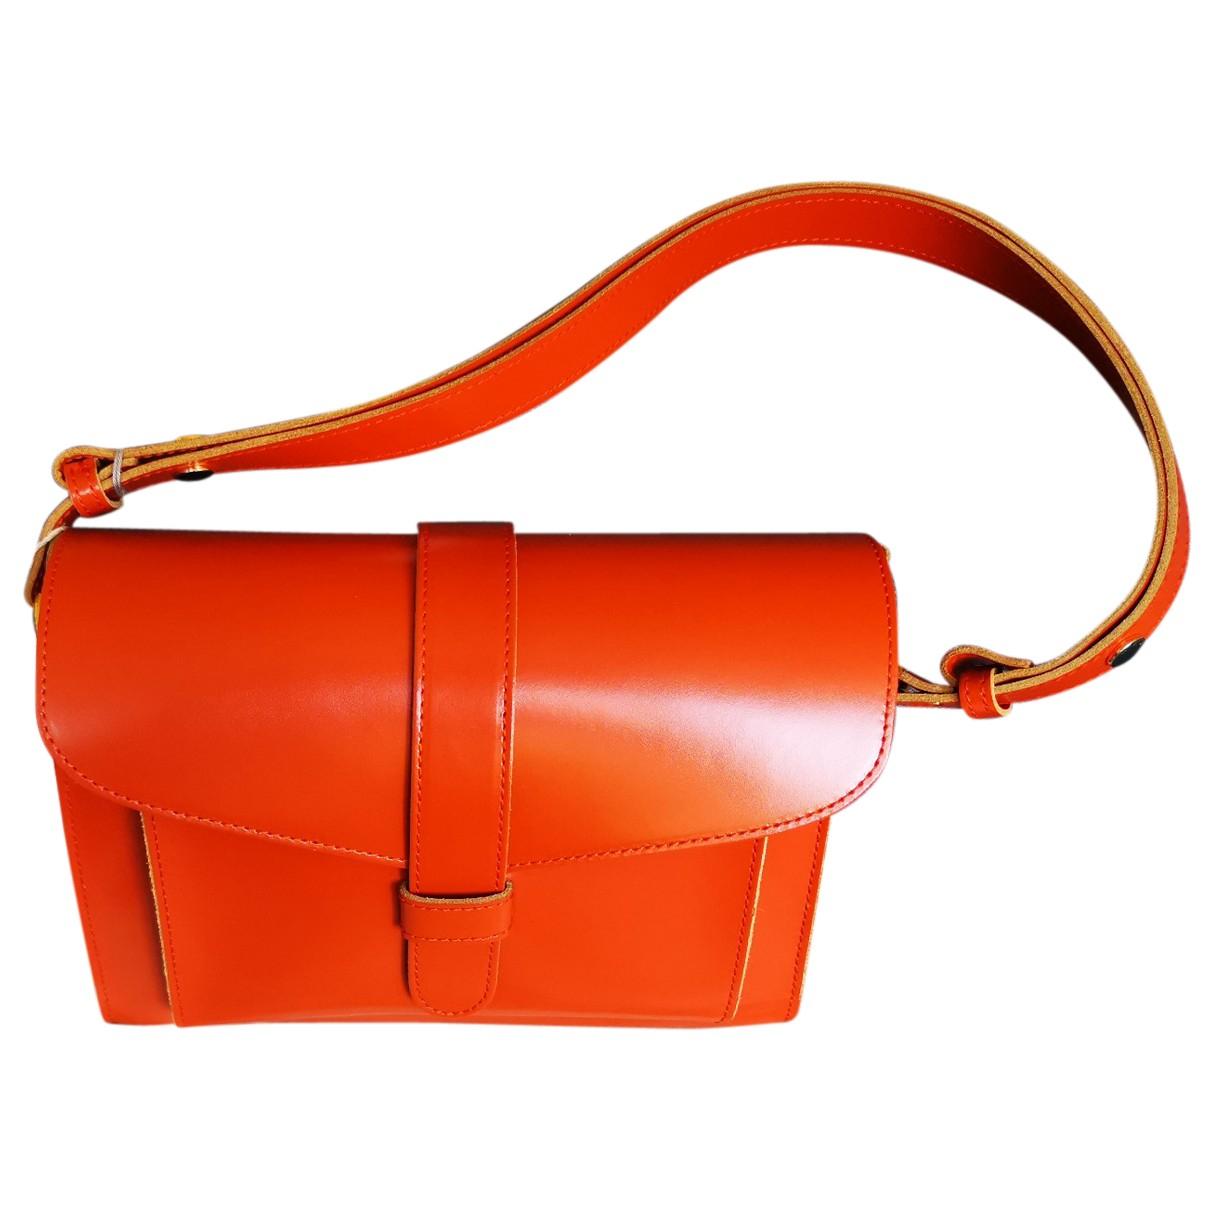 Marni N Orange Leather handbag for Women N